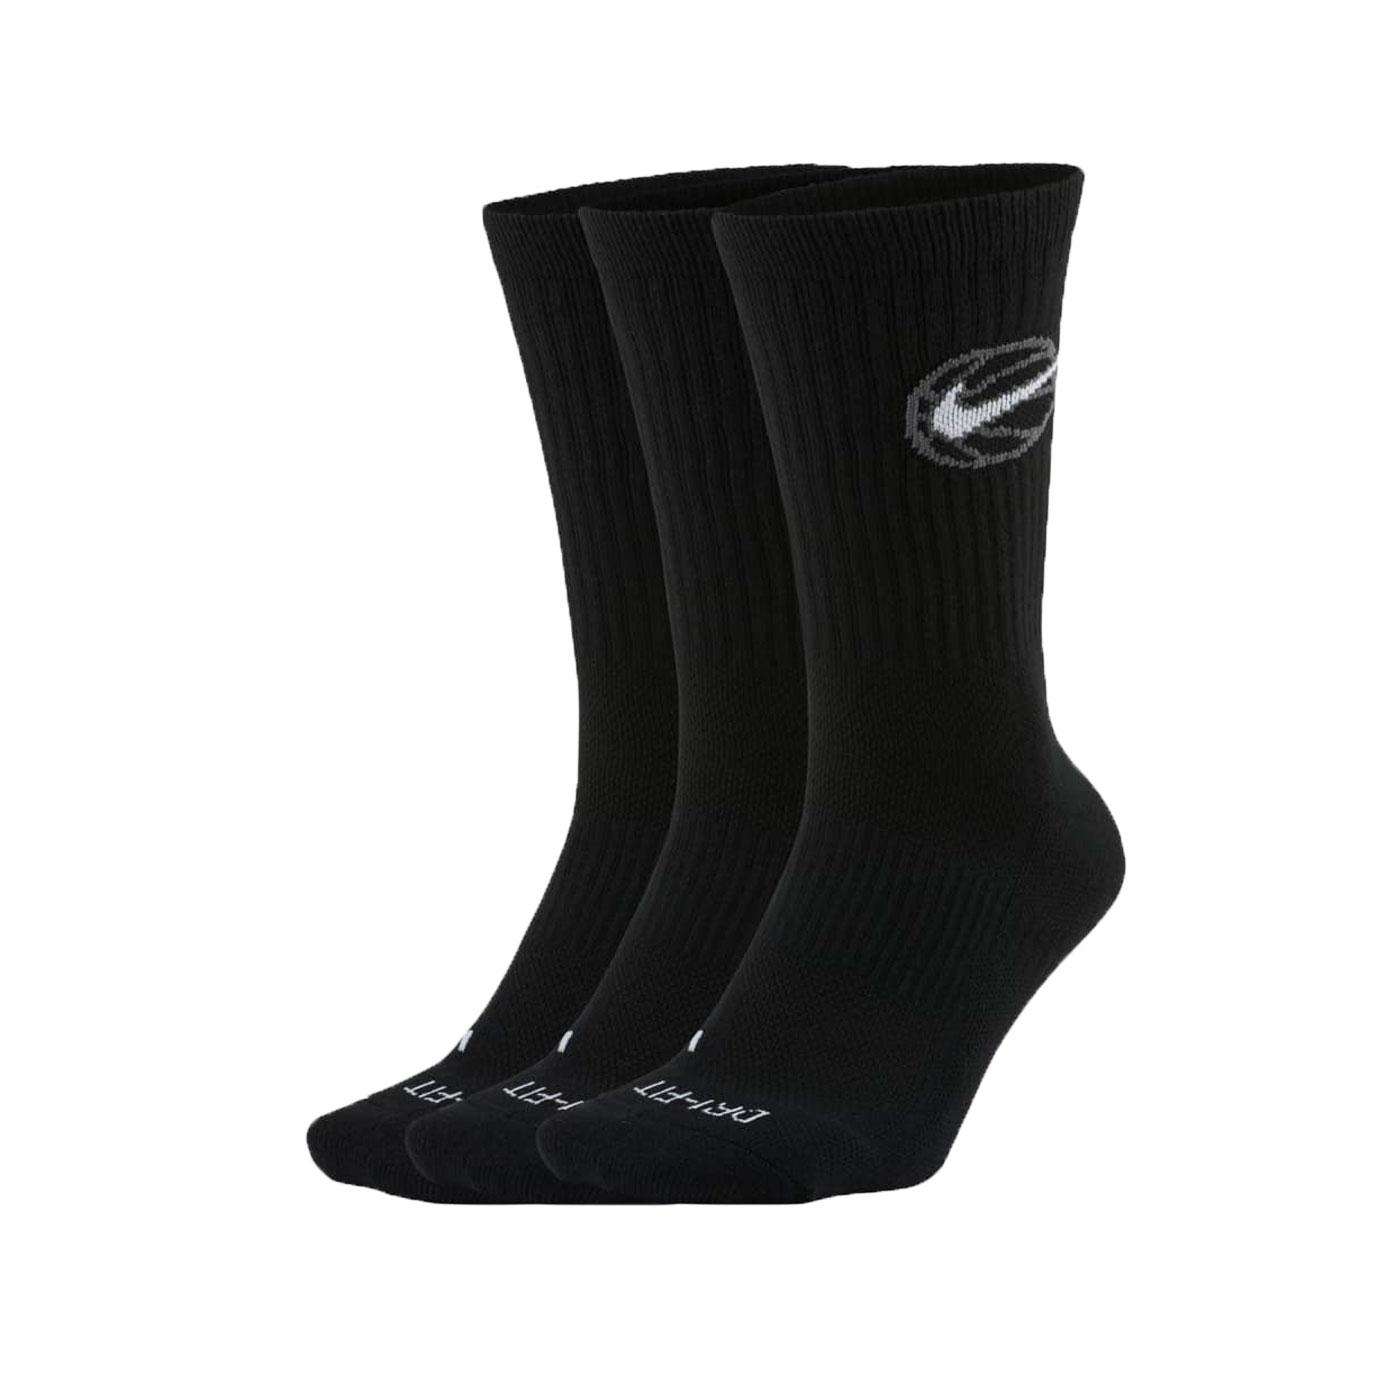 NIKE 襪子 DA2123-010 - 黑白灰